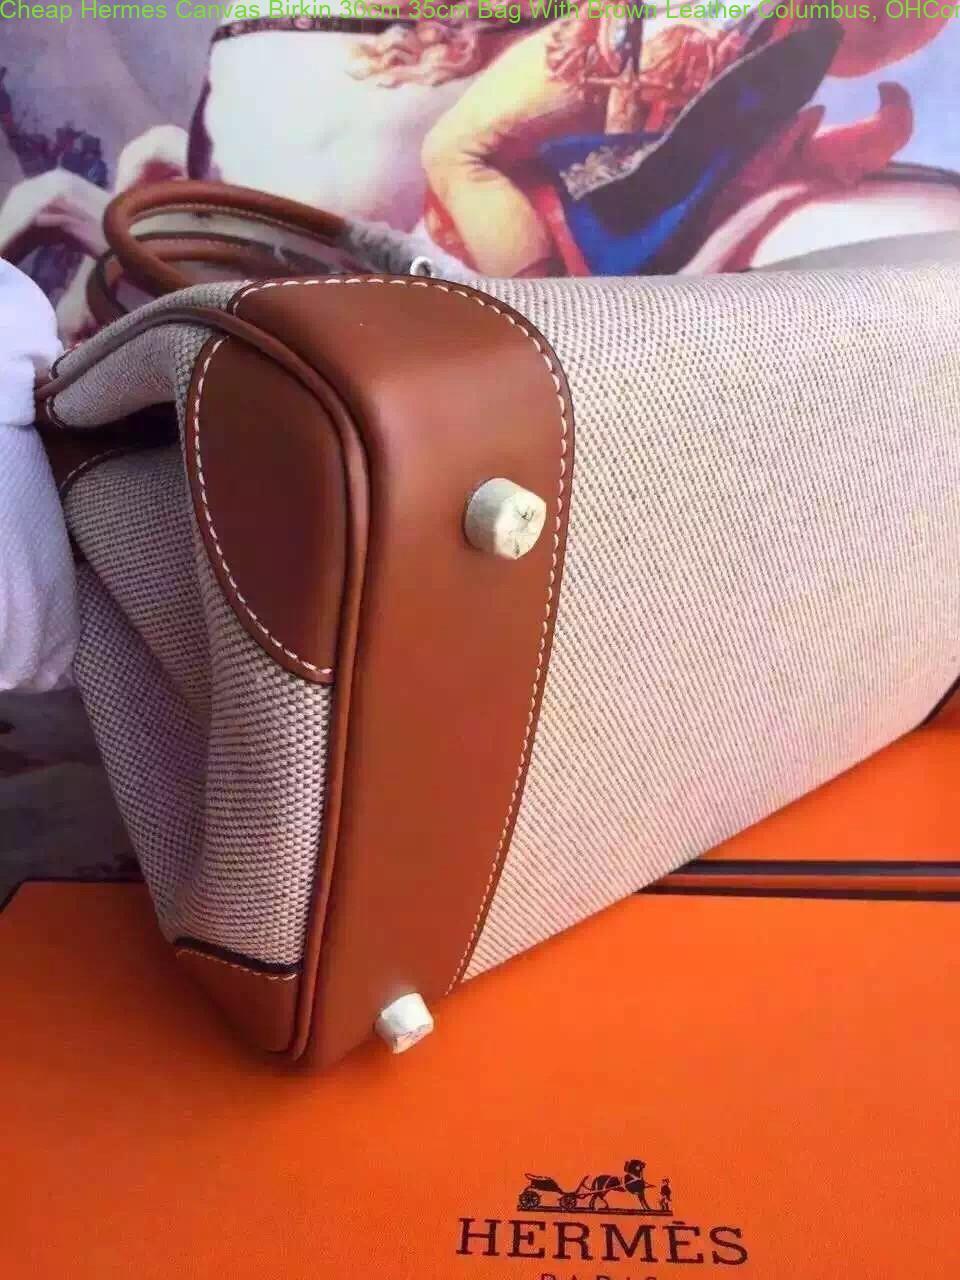 8b8a2ff0f0 Cheap Hermes Canvas Birkin 30cm 35cm Bag With Brown Leather Columbus ...